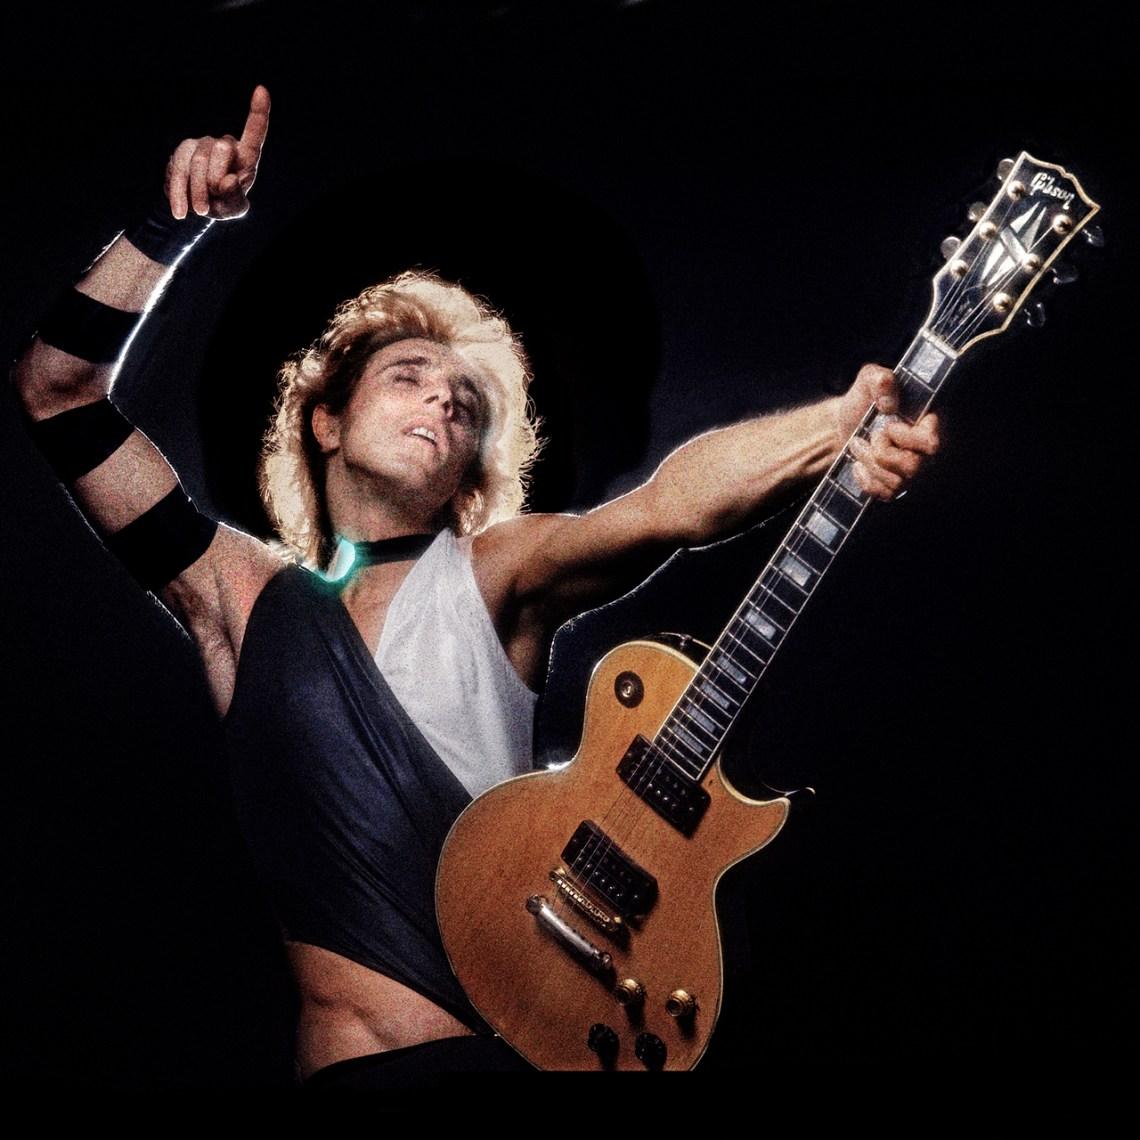 Mick-Ronson-Guitar.-new-2.jpg